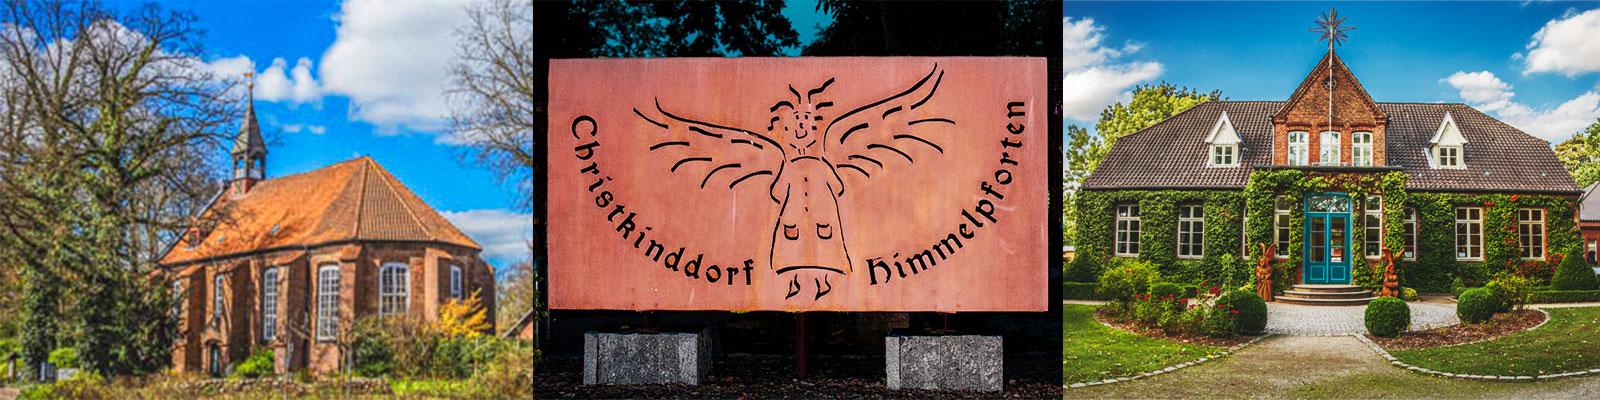 Christkinddorf Himmelpforten Banner